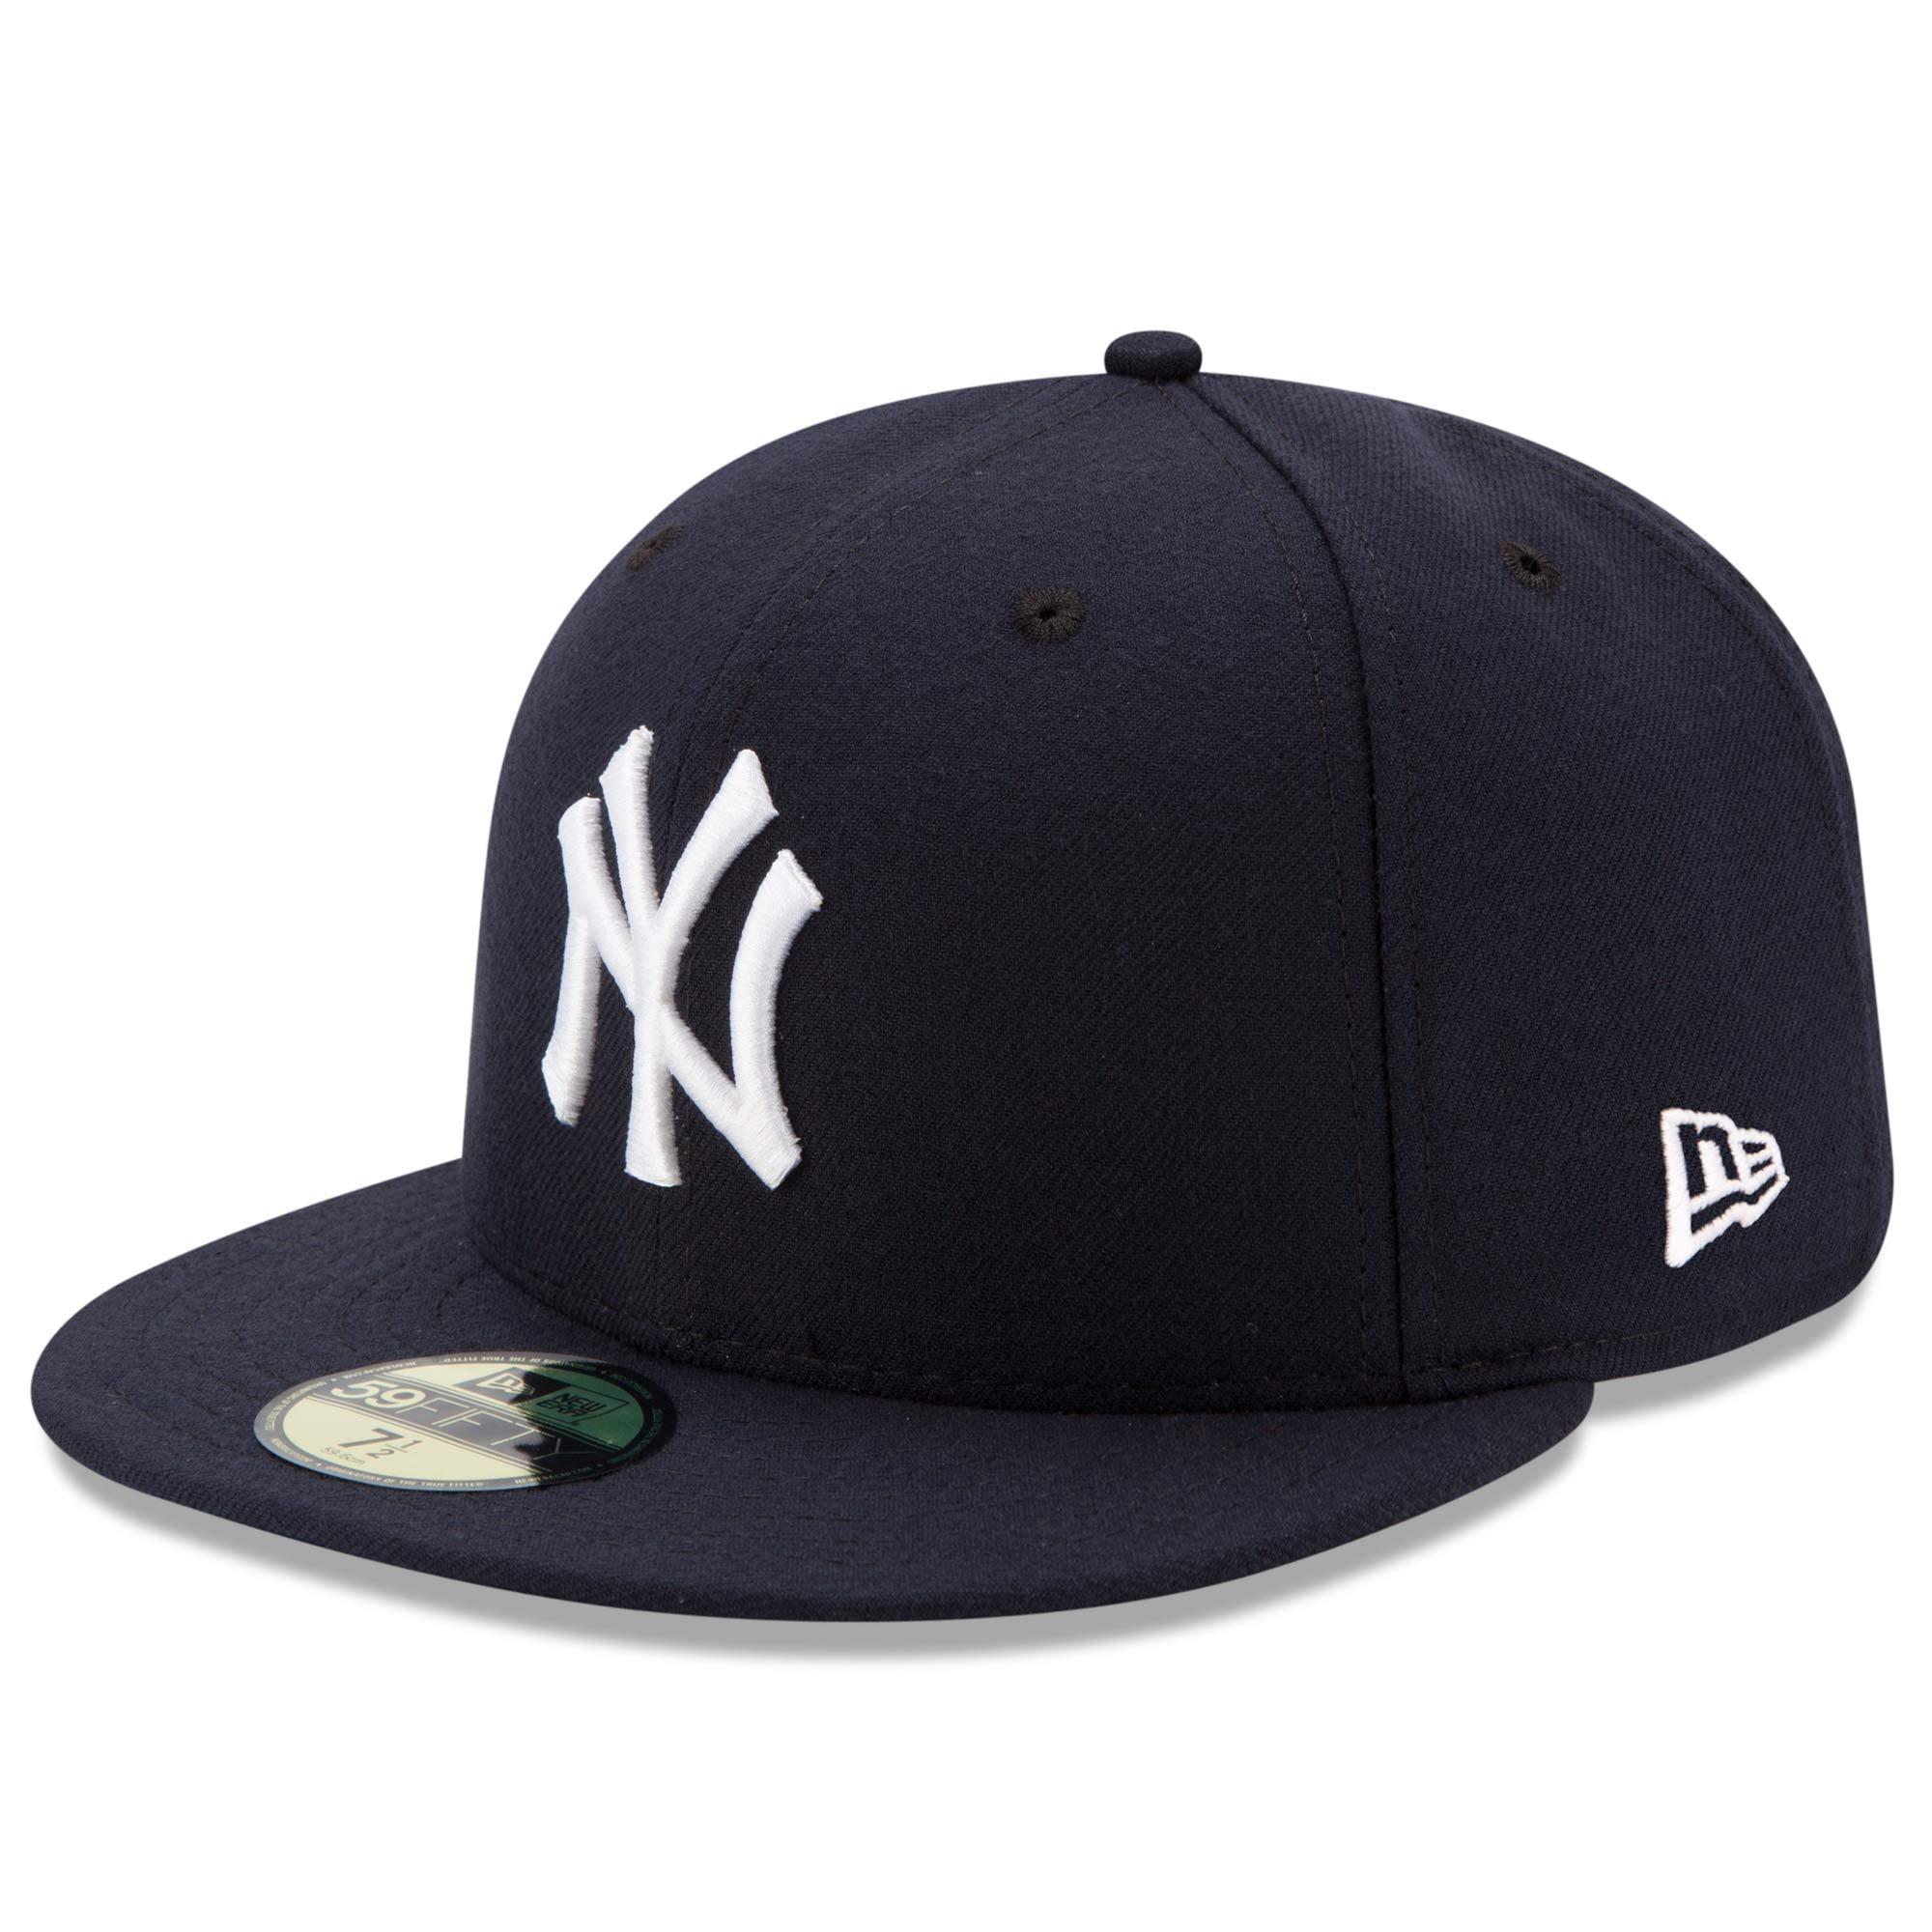 8f2e35058 New York Yankees Team Shop - Walmart.com